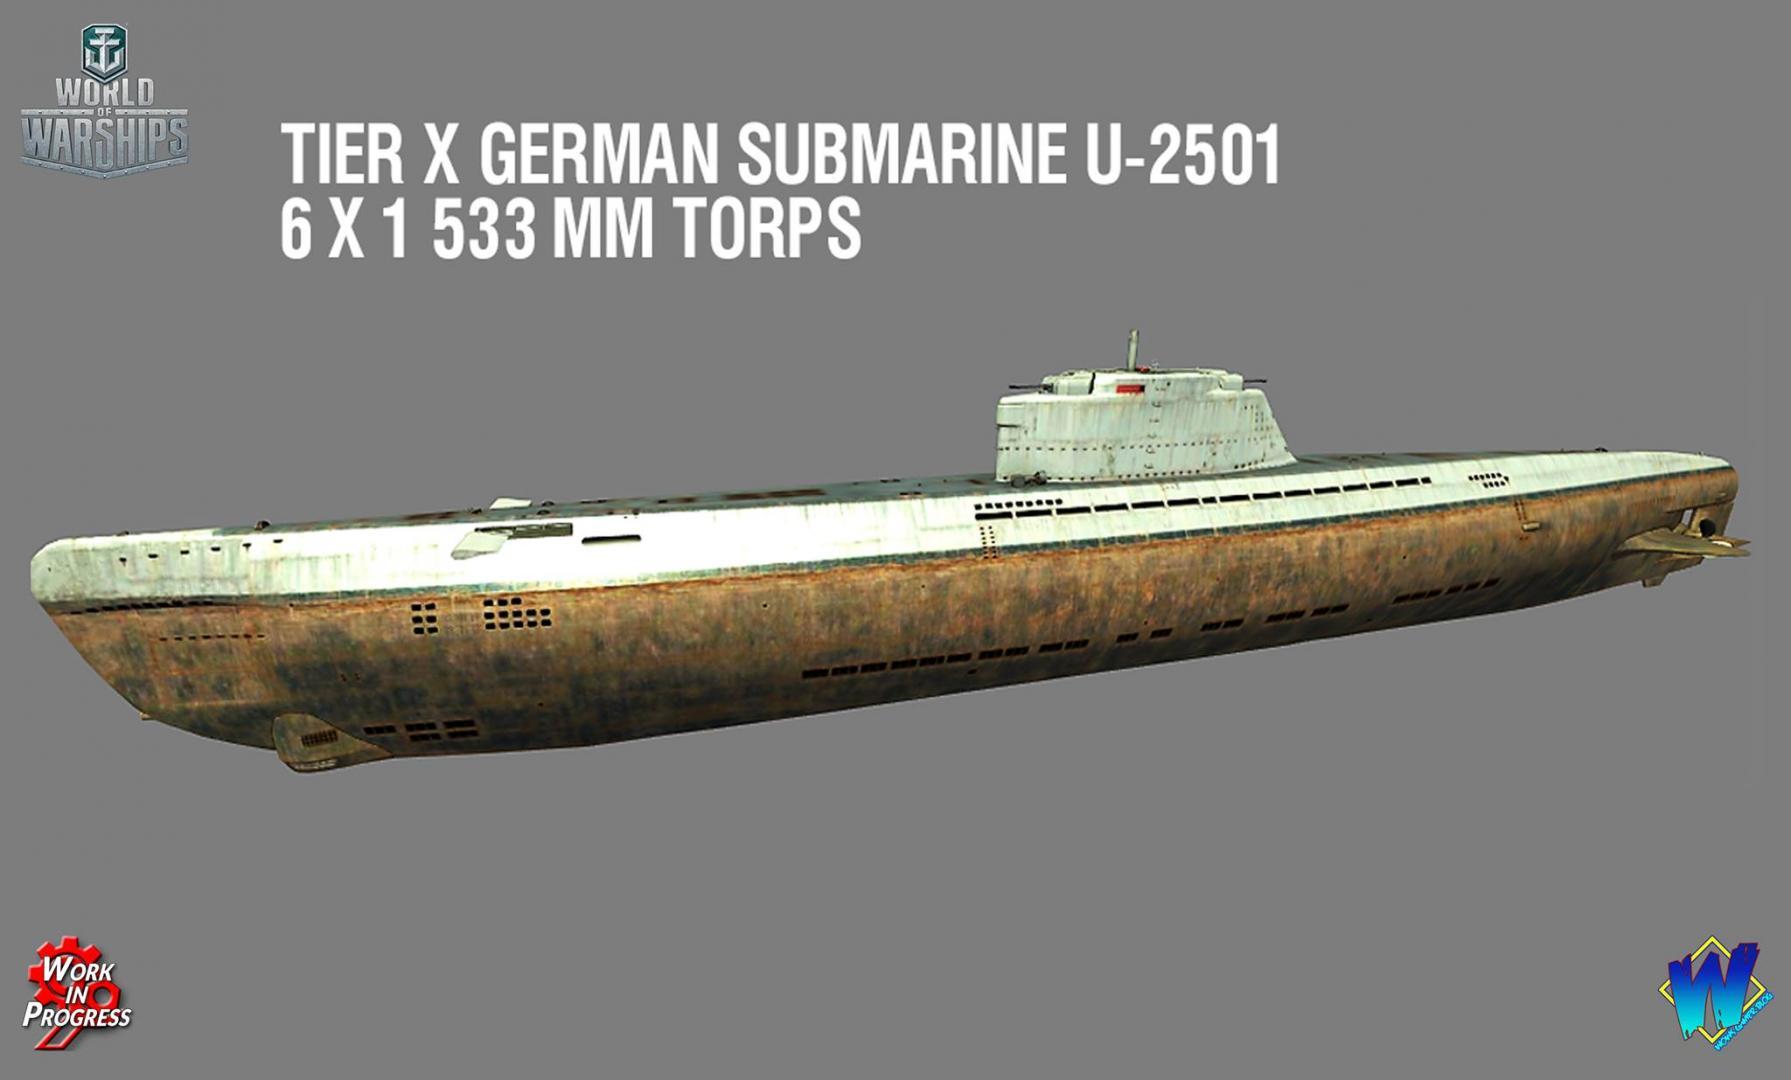 TierX-Germansub-U-2501.jpg